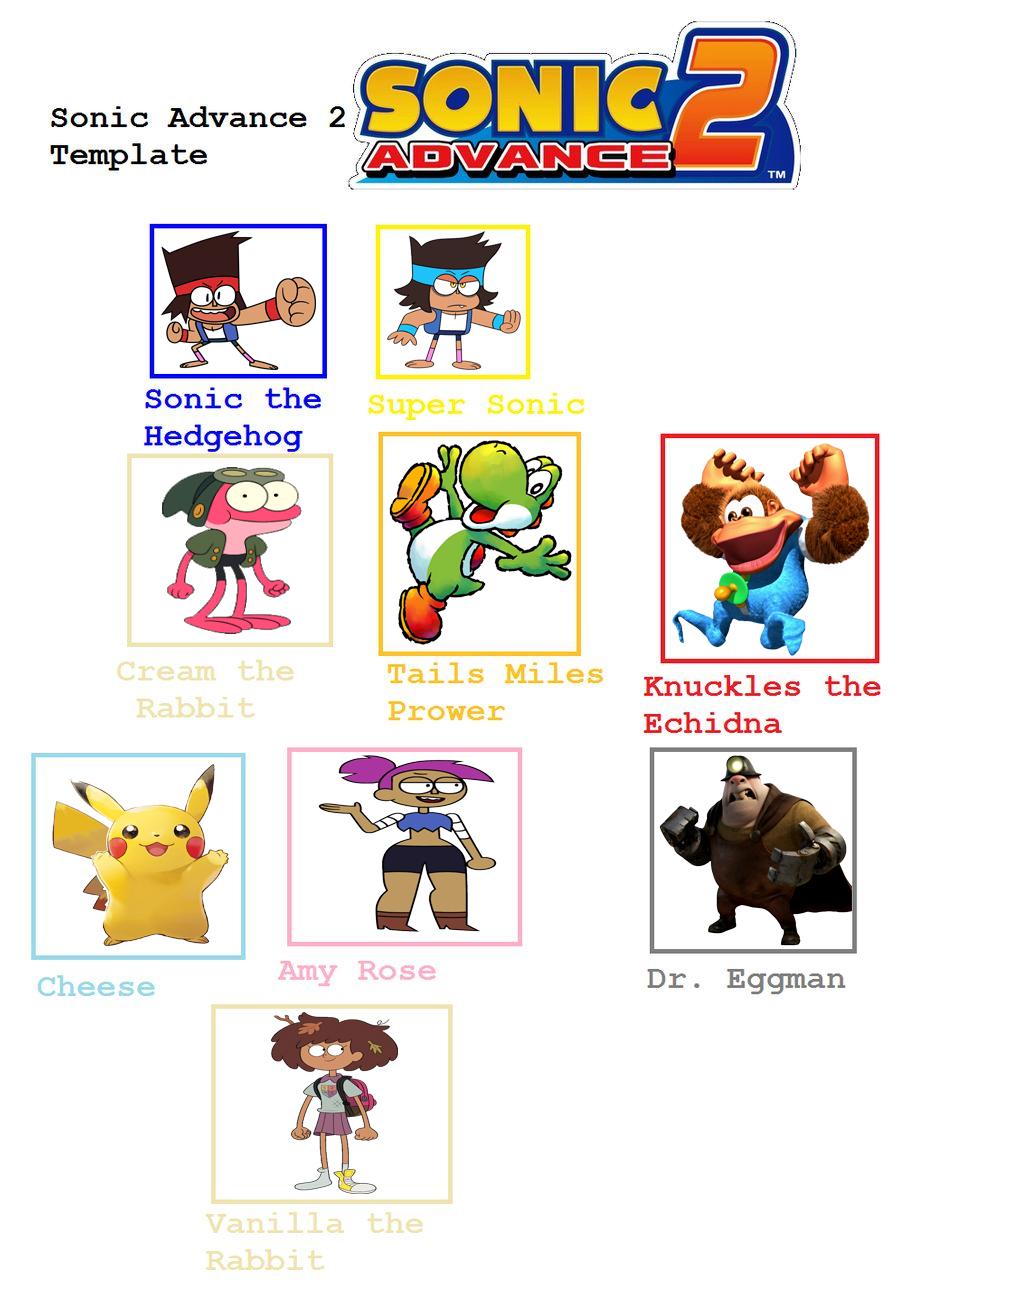 My Sonic Advance 2 Cast Meme By Vinhchaule On Deviantart